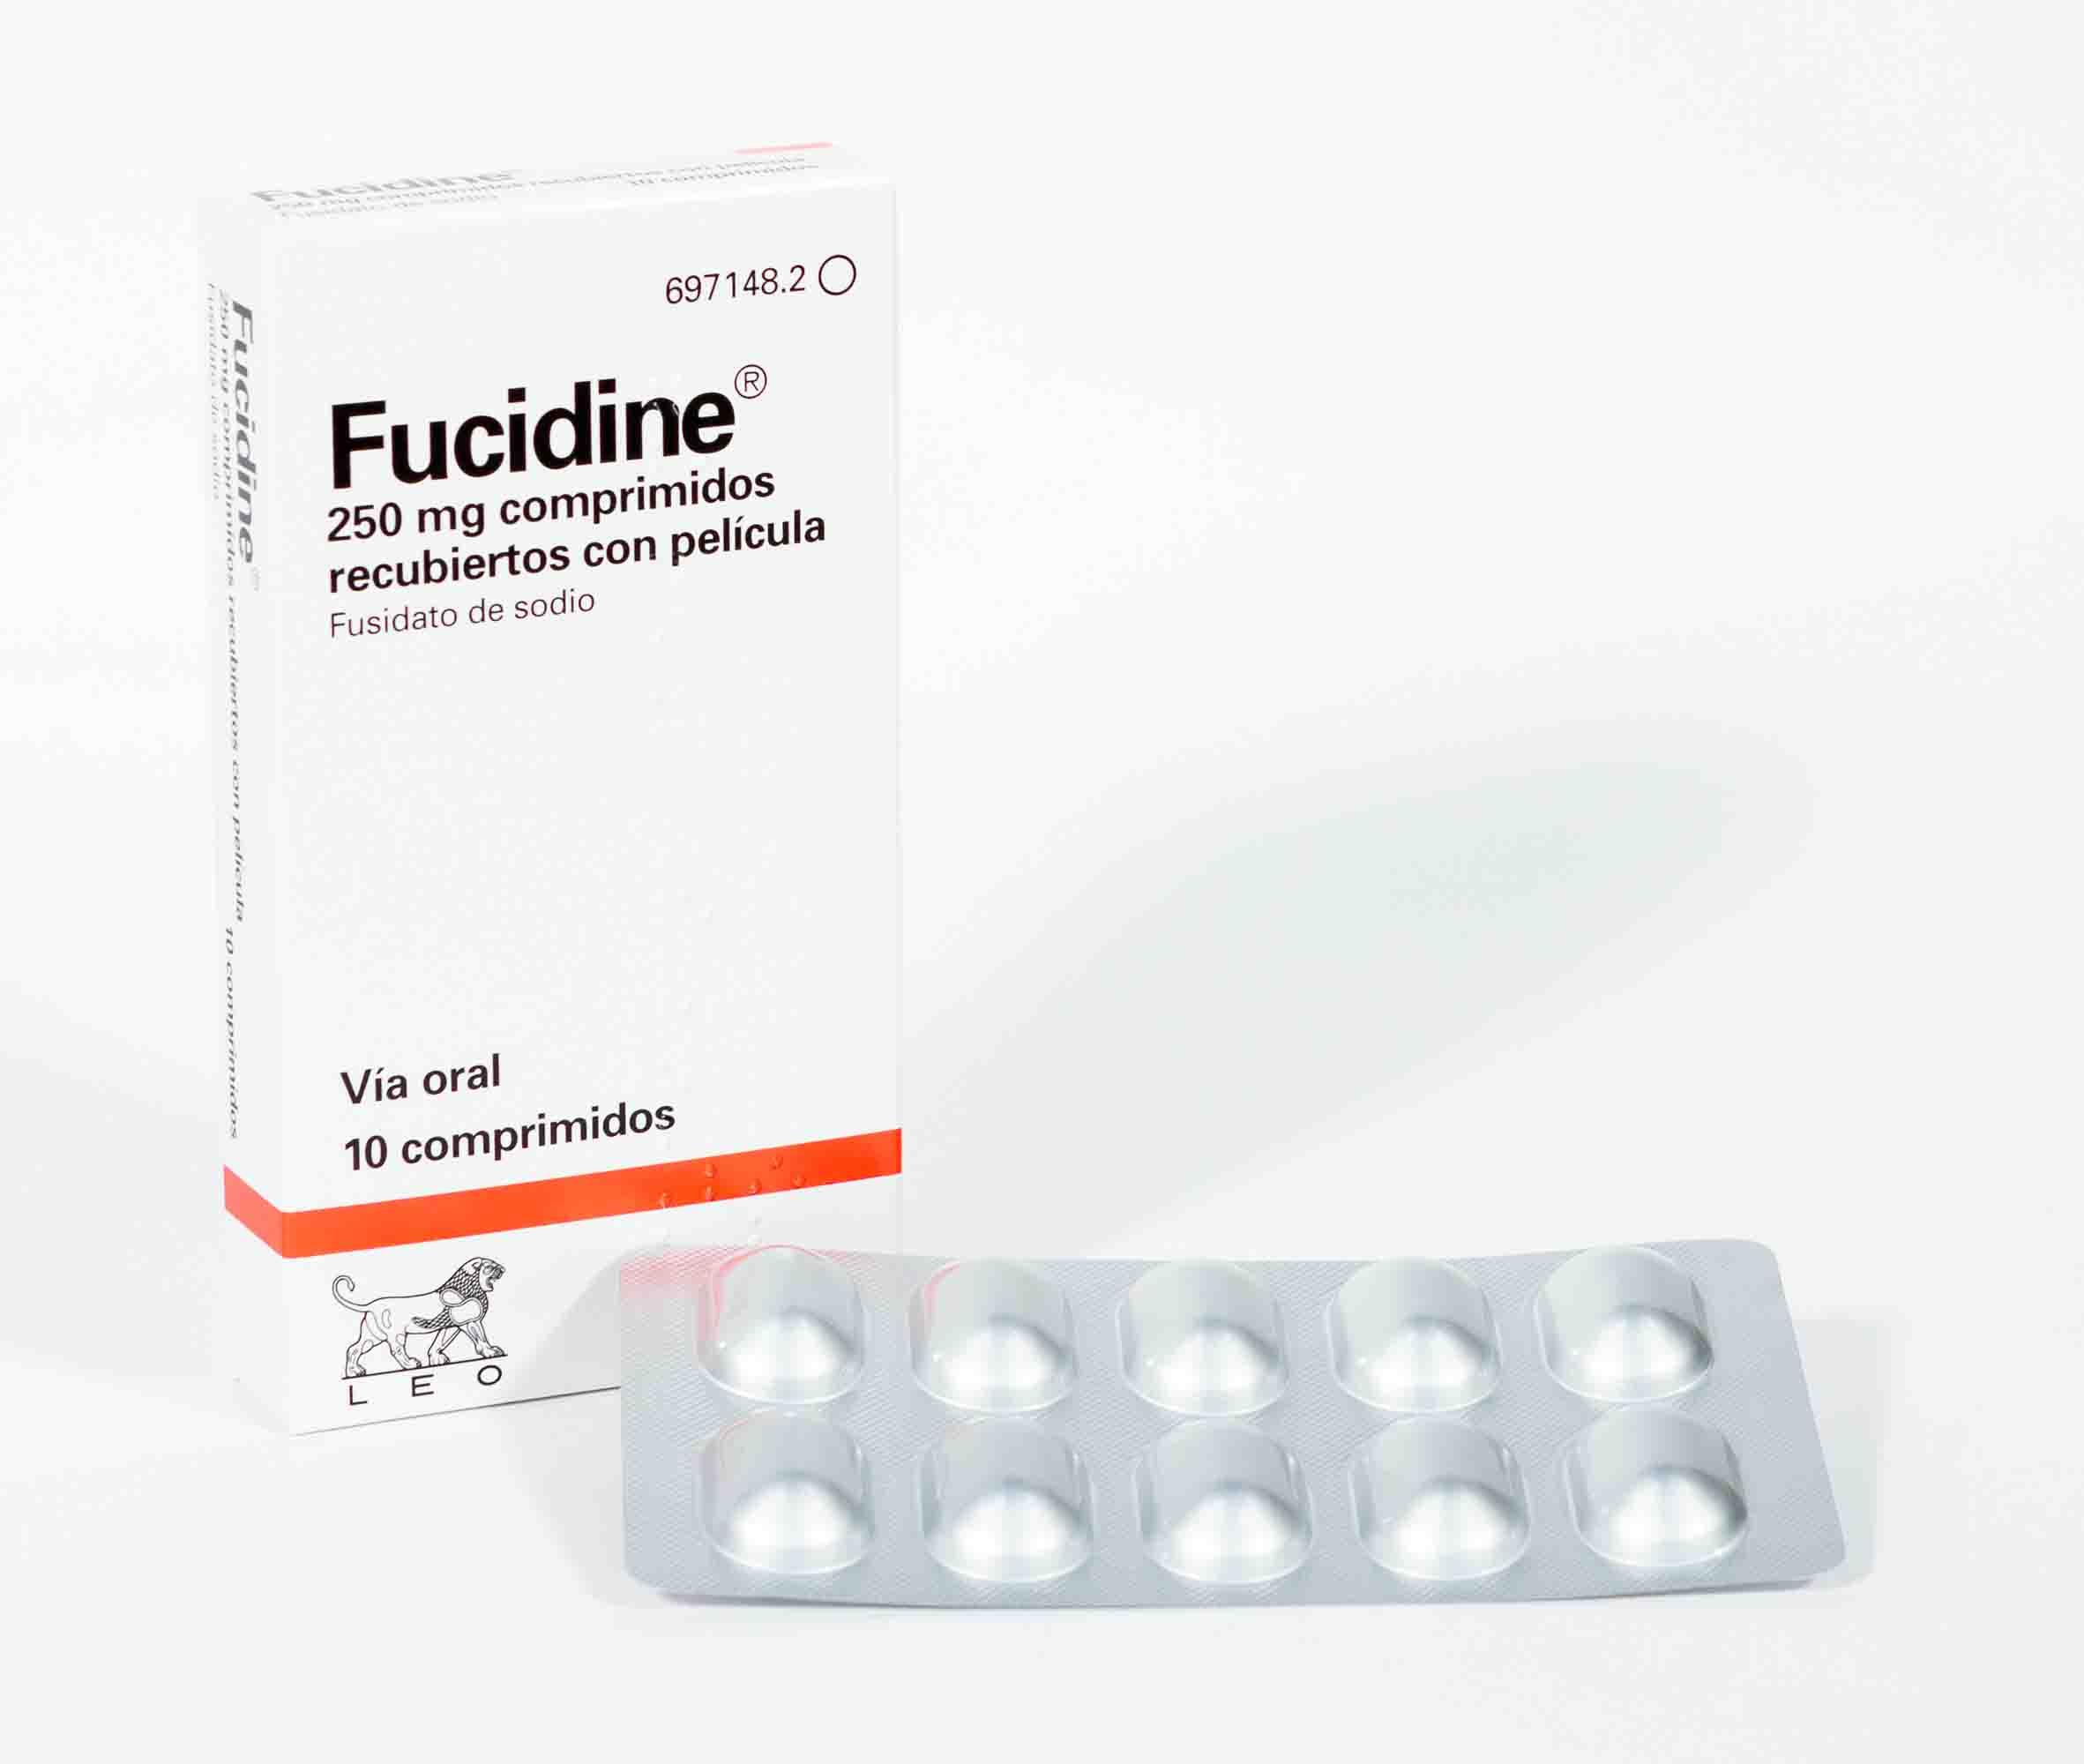 Fucidine 250 mg - Carabiens le Forum